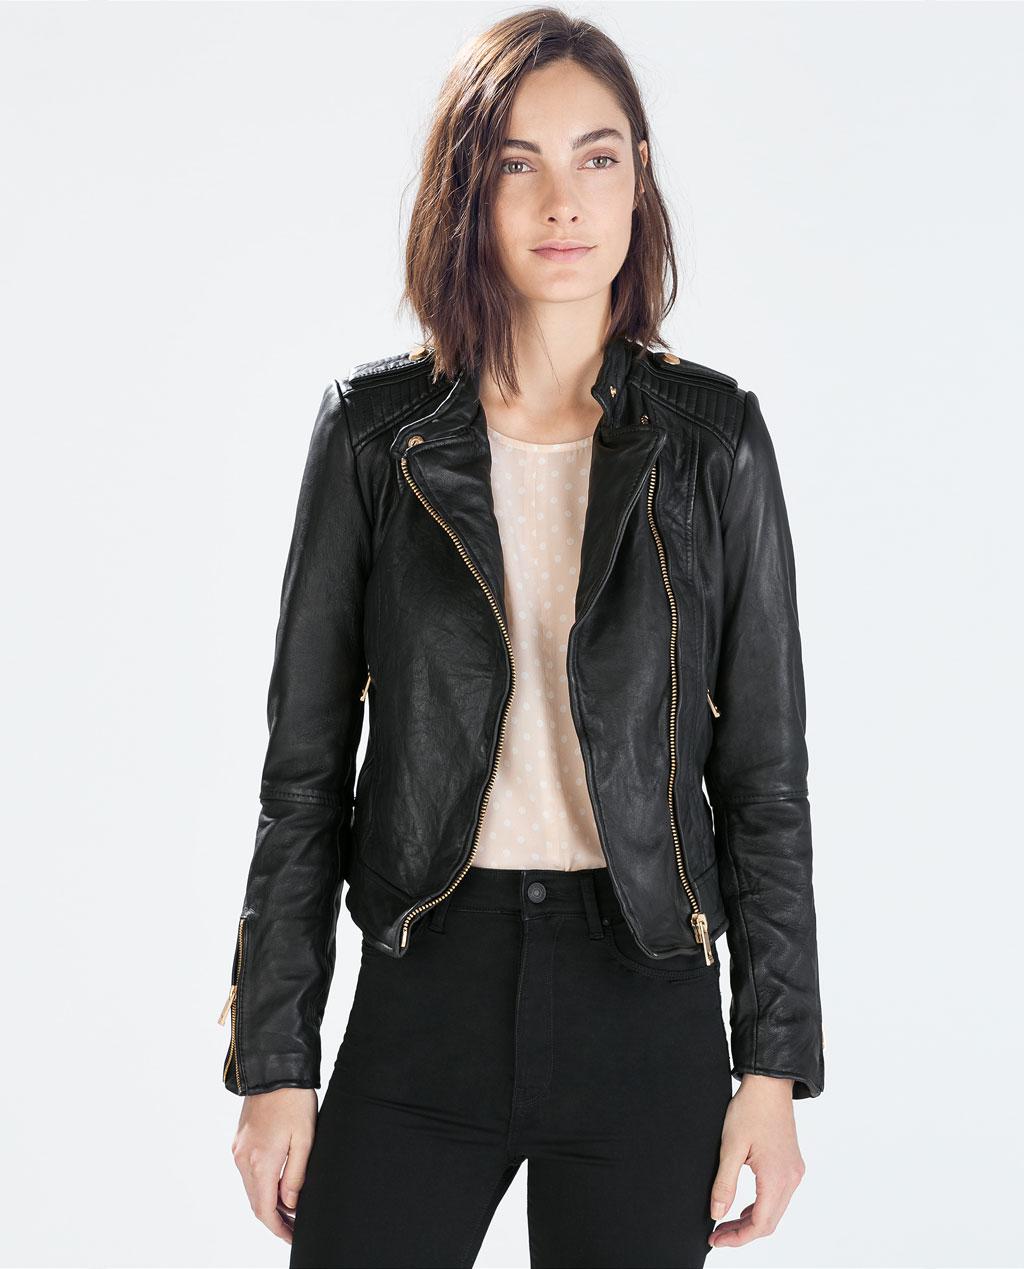 Zara  Leather Biker Jacket  ($279)